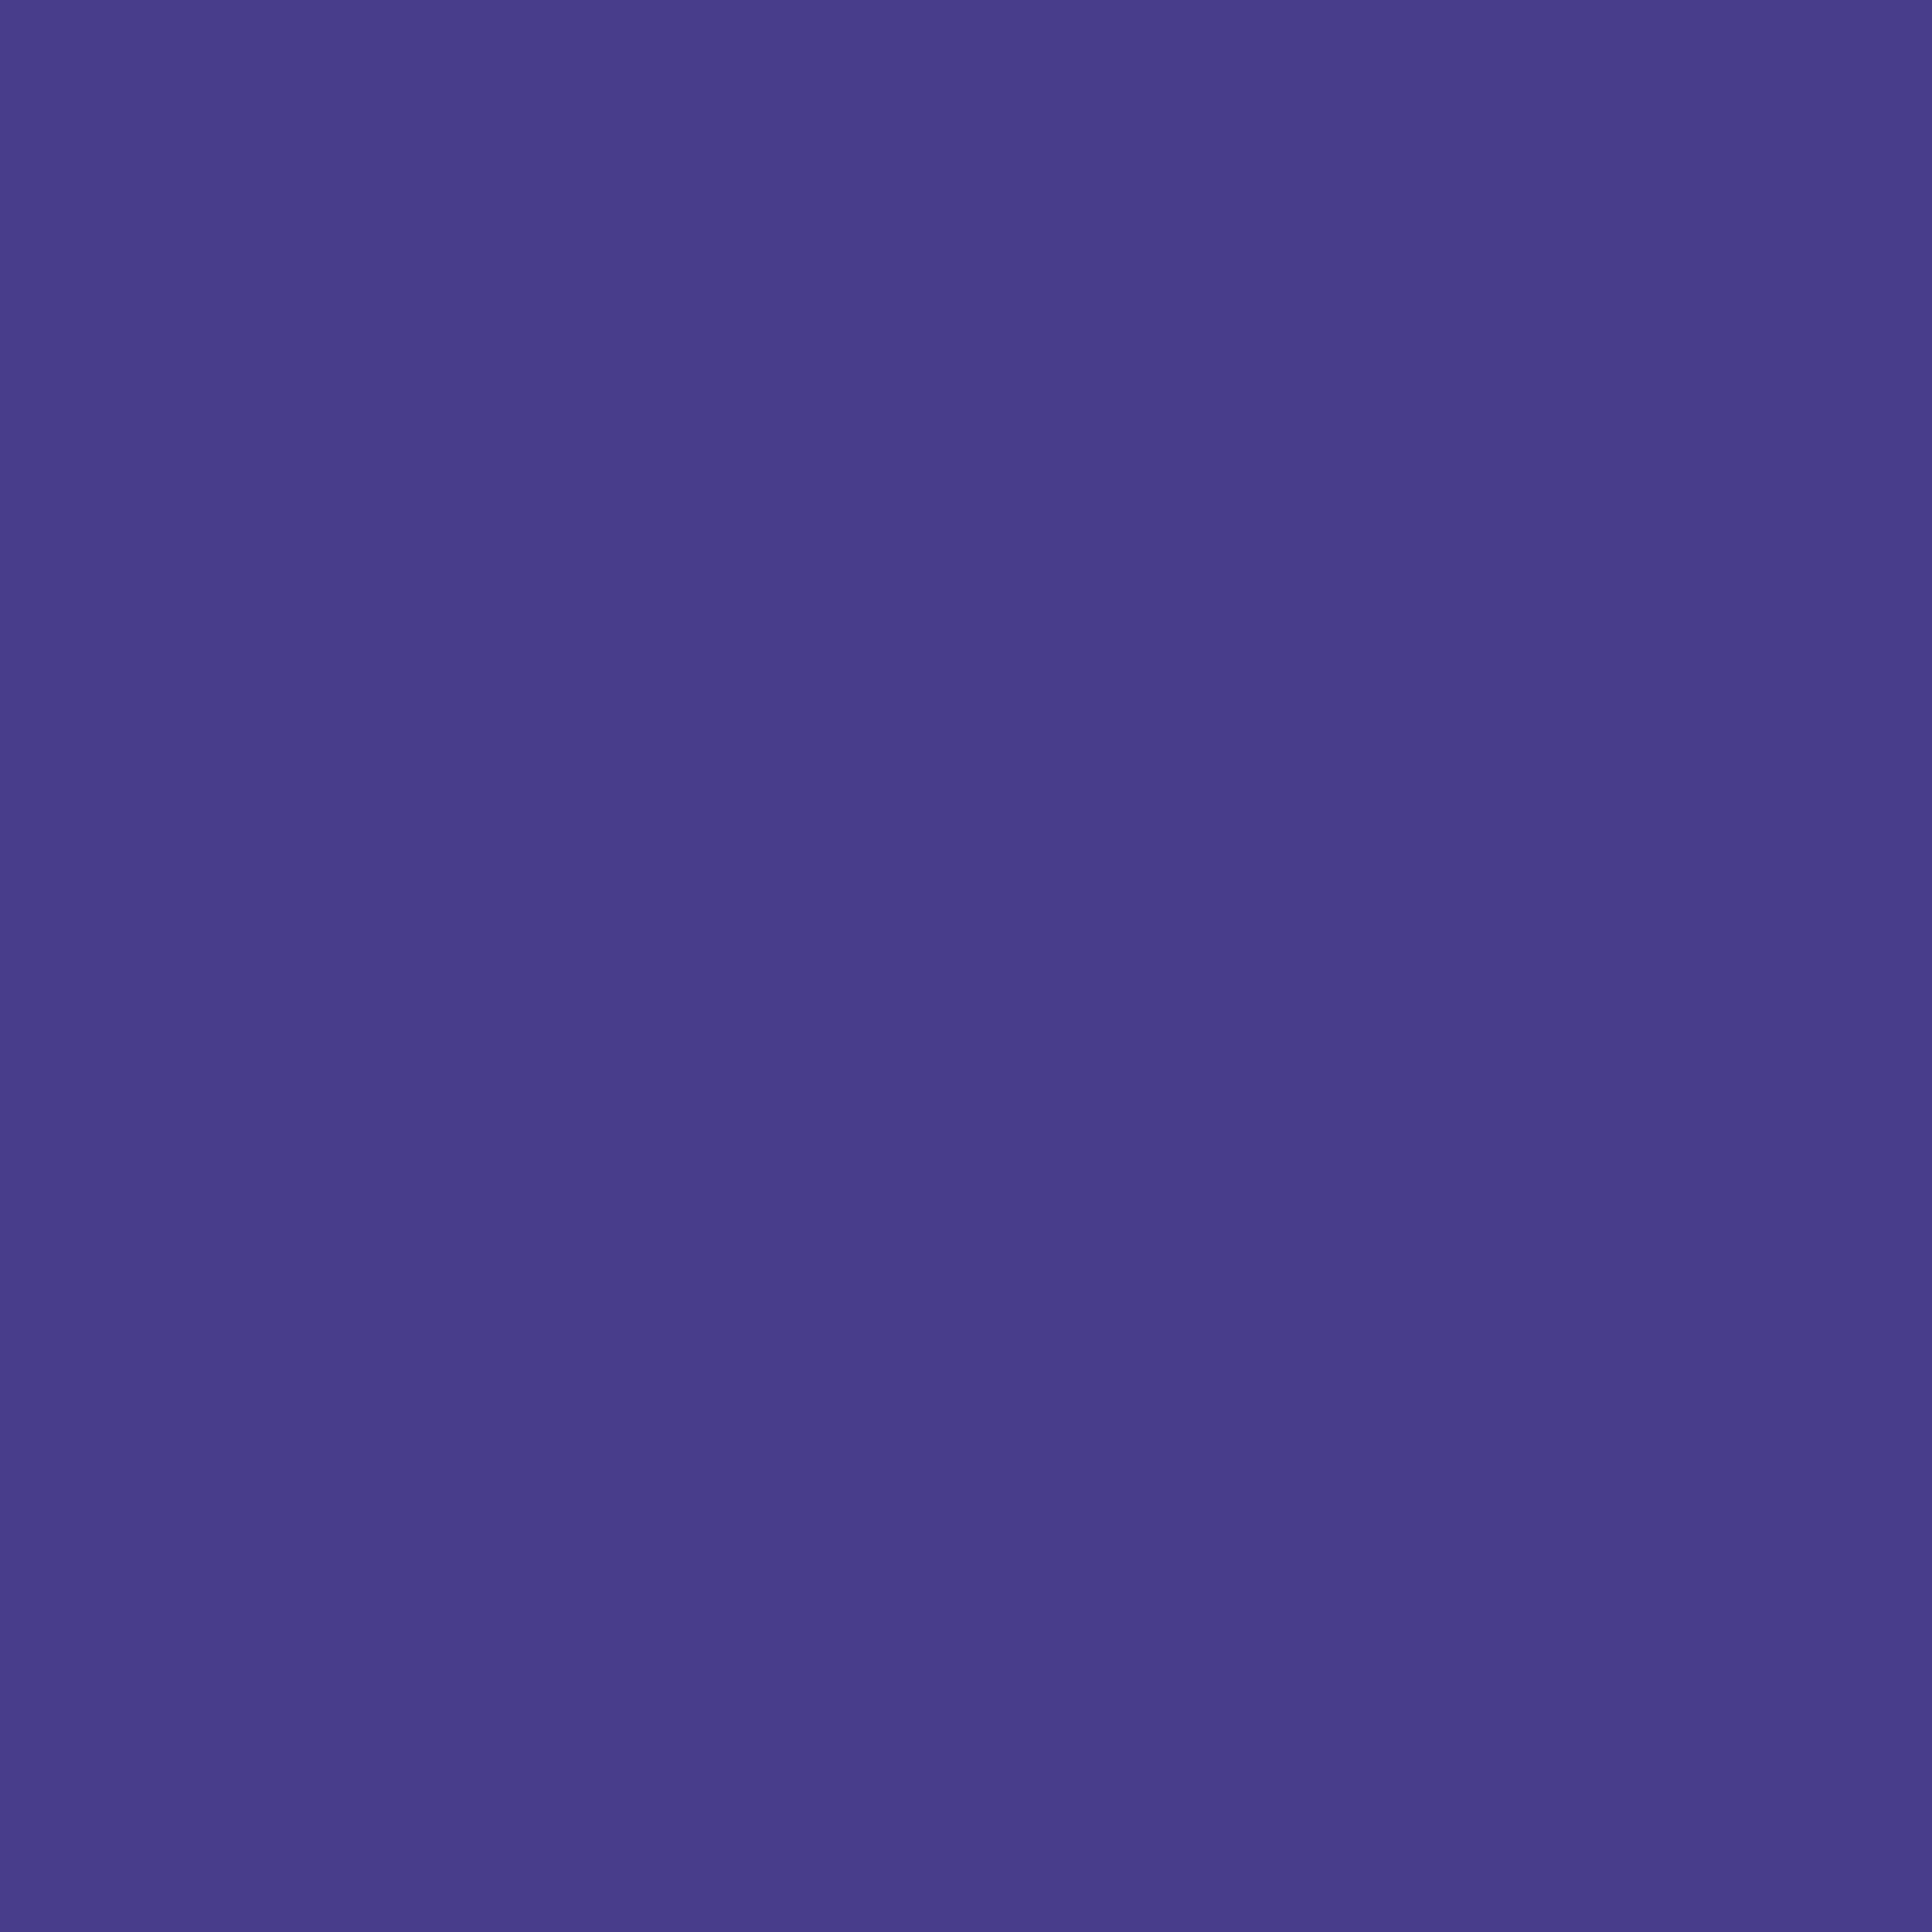 3600x3600 Dark Slate Blue Solid Color Background